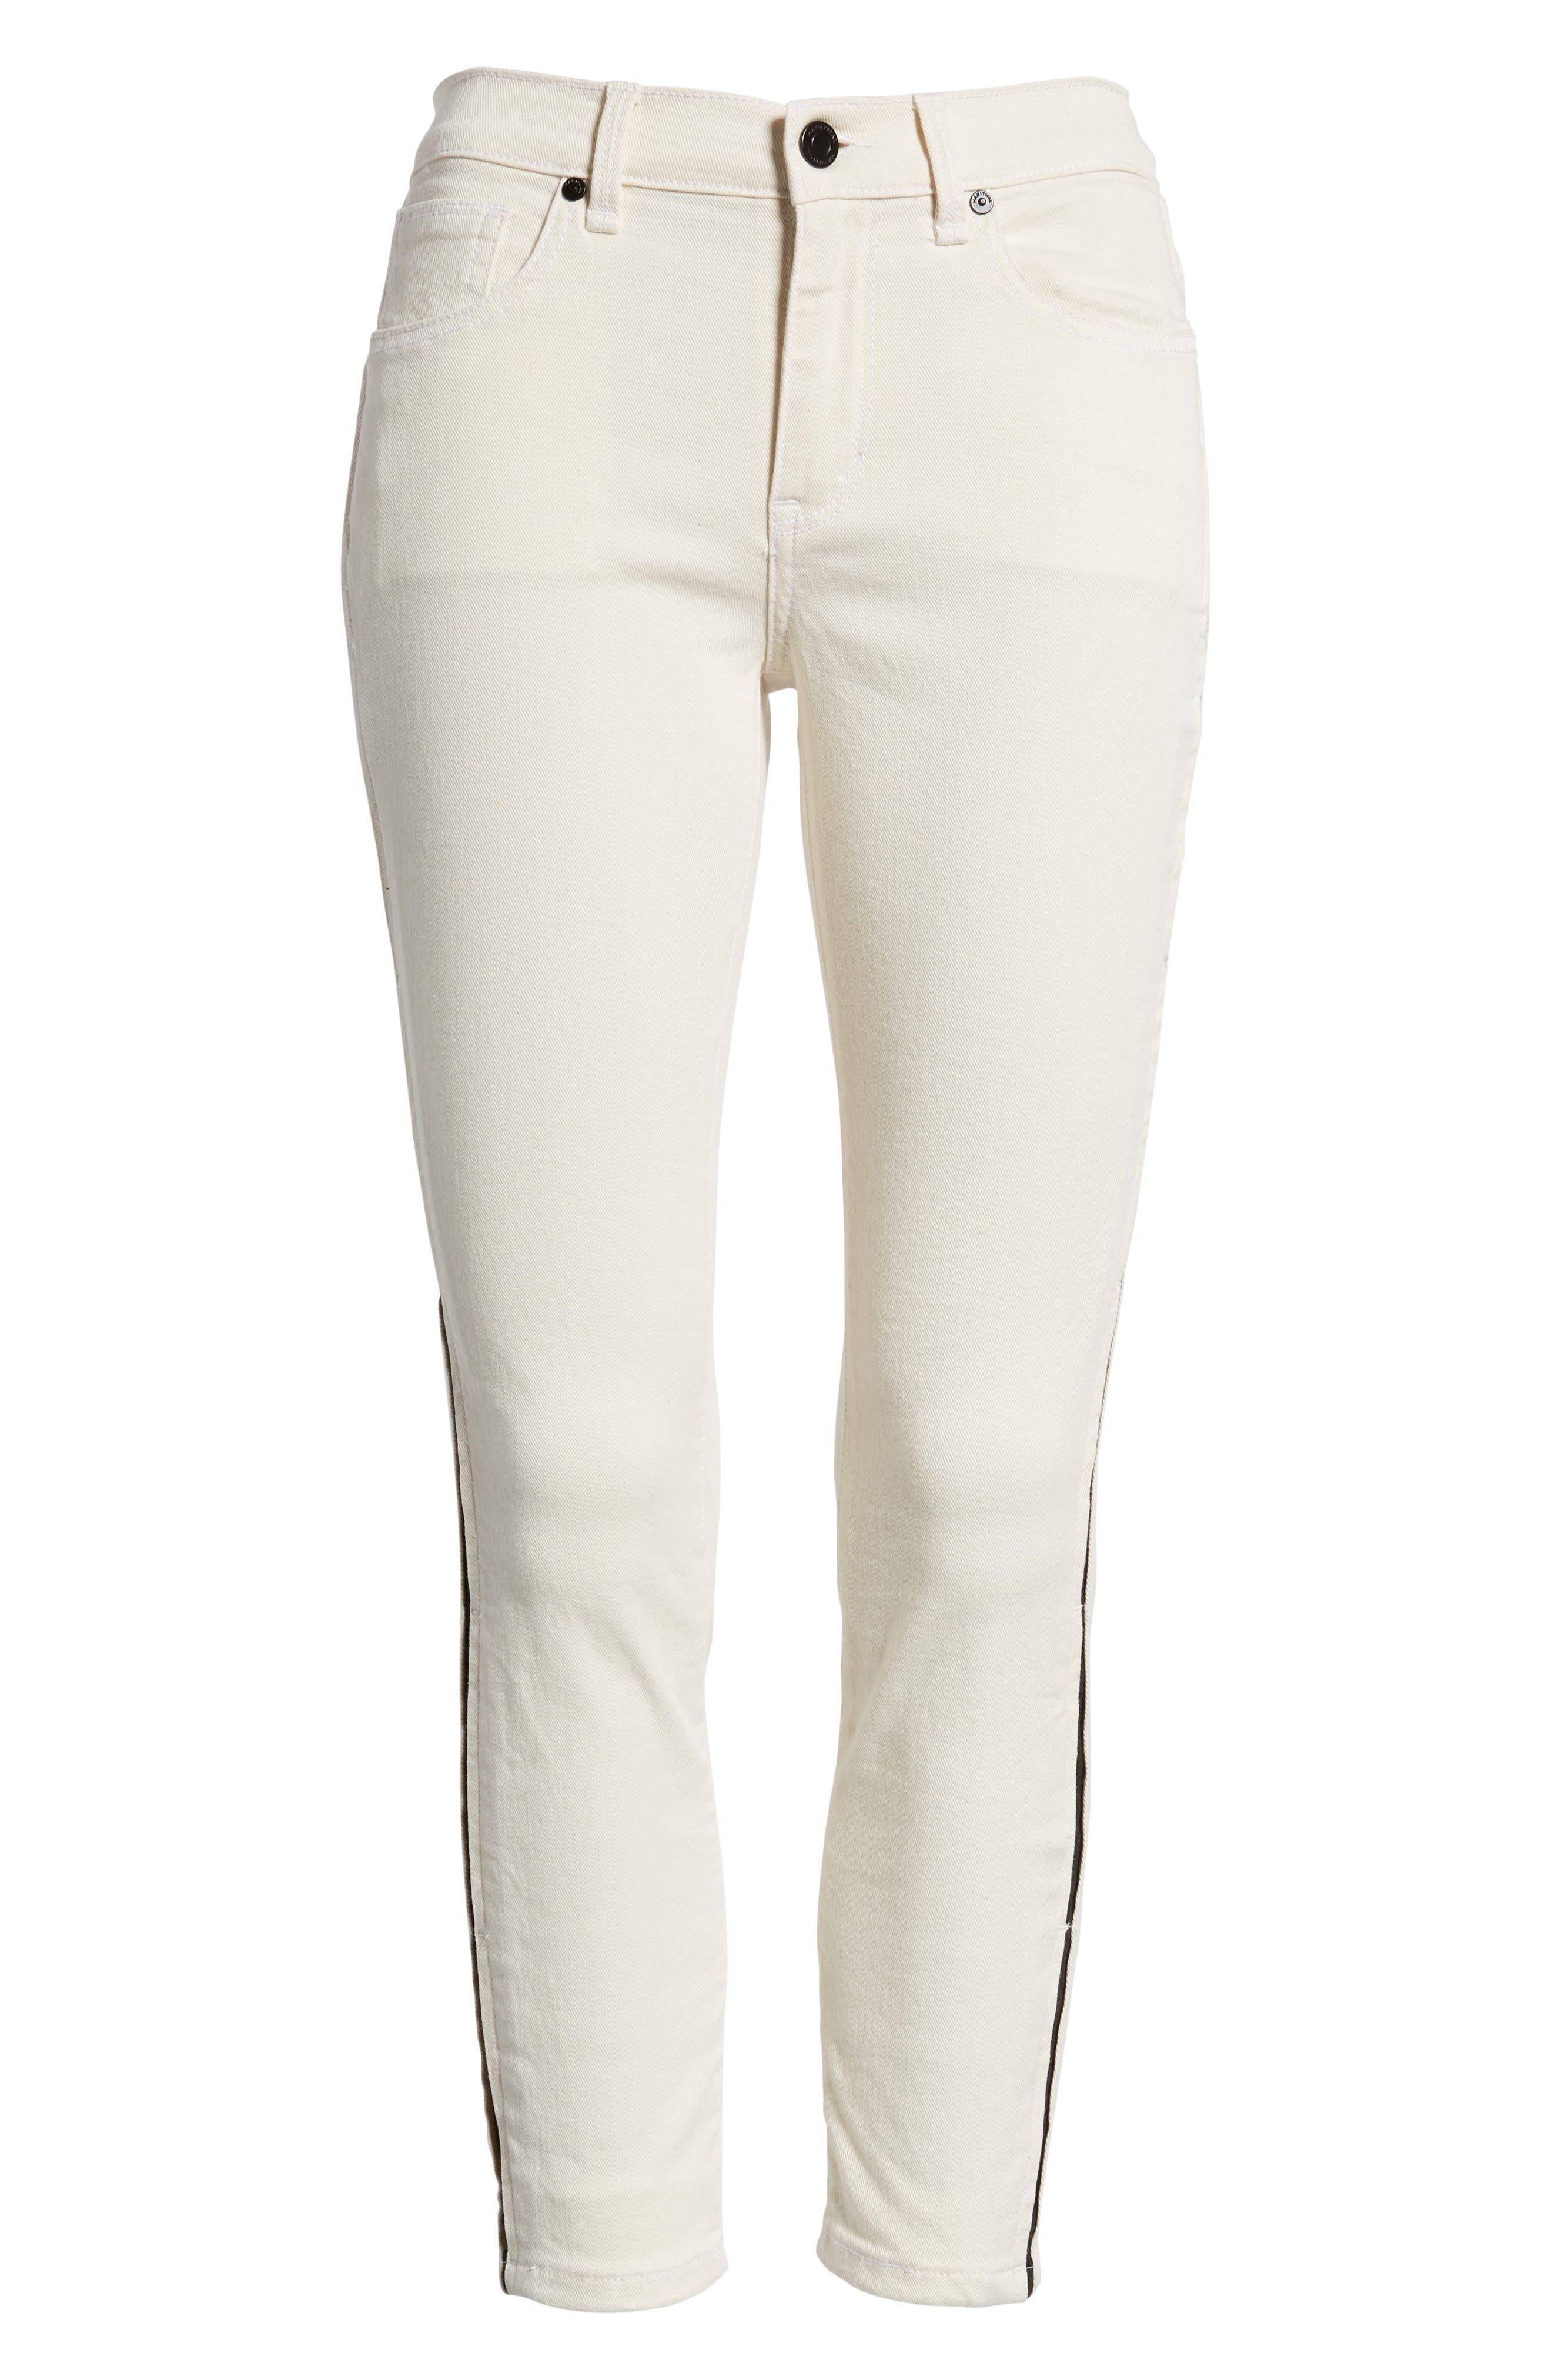 Demi Inset Stripe Skinny Jeans,                             Alternate thumbnail 7, color,                             Natural